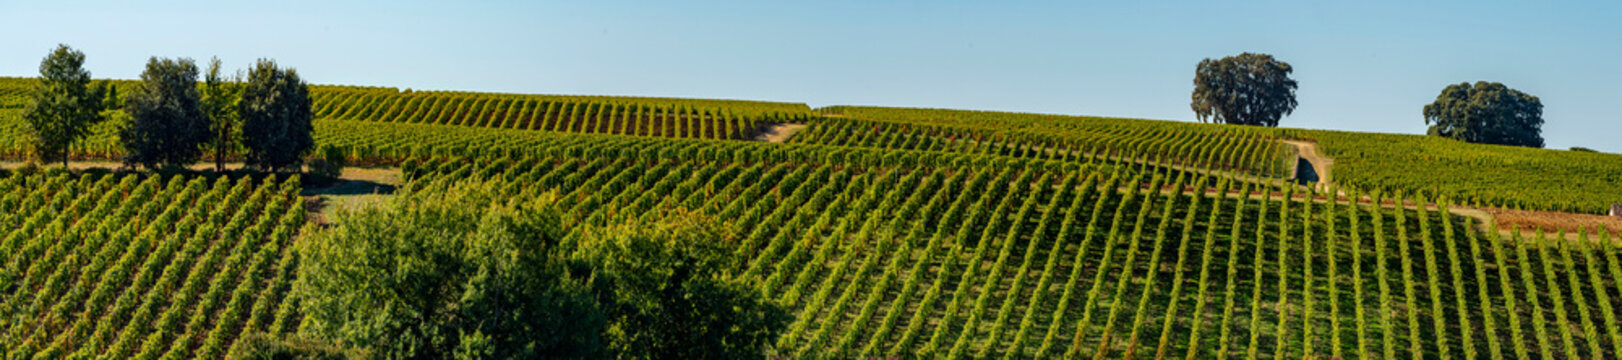 Vineyards of Saint Emilion, Bordeaux Vineyards, terraced vineyard